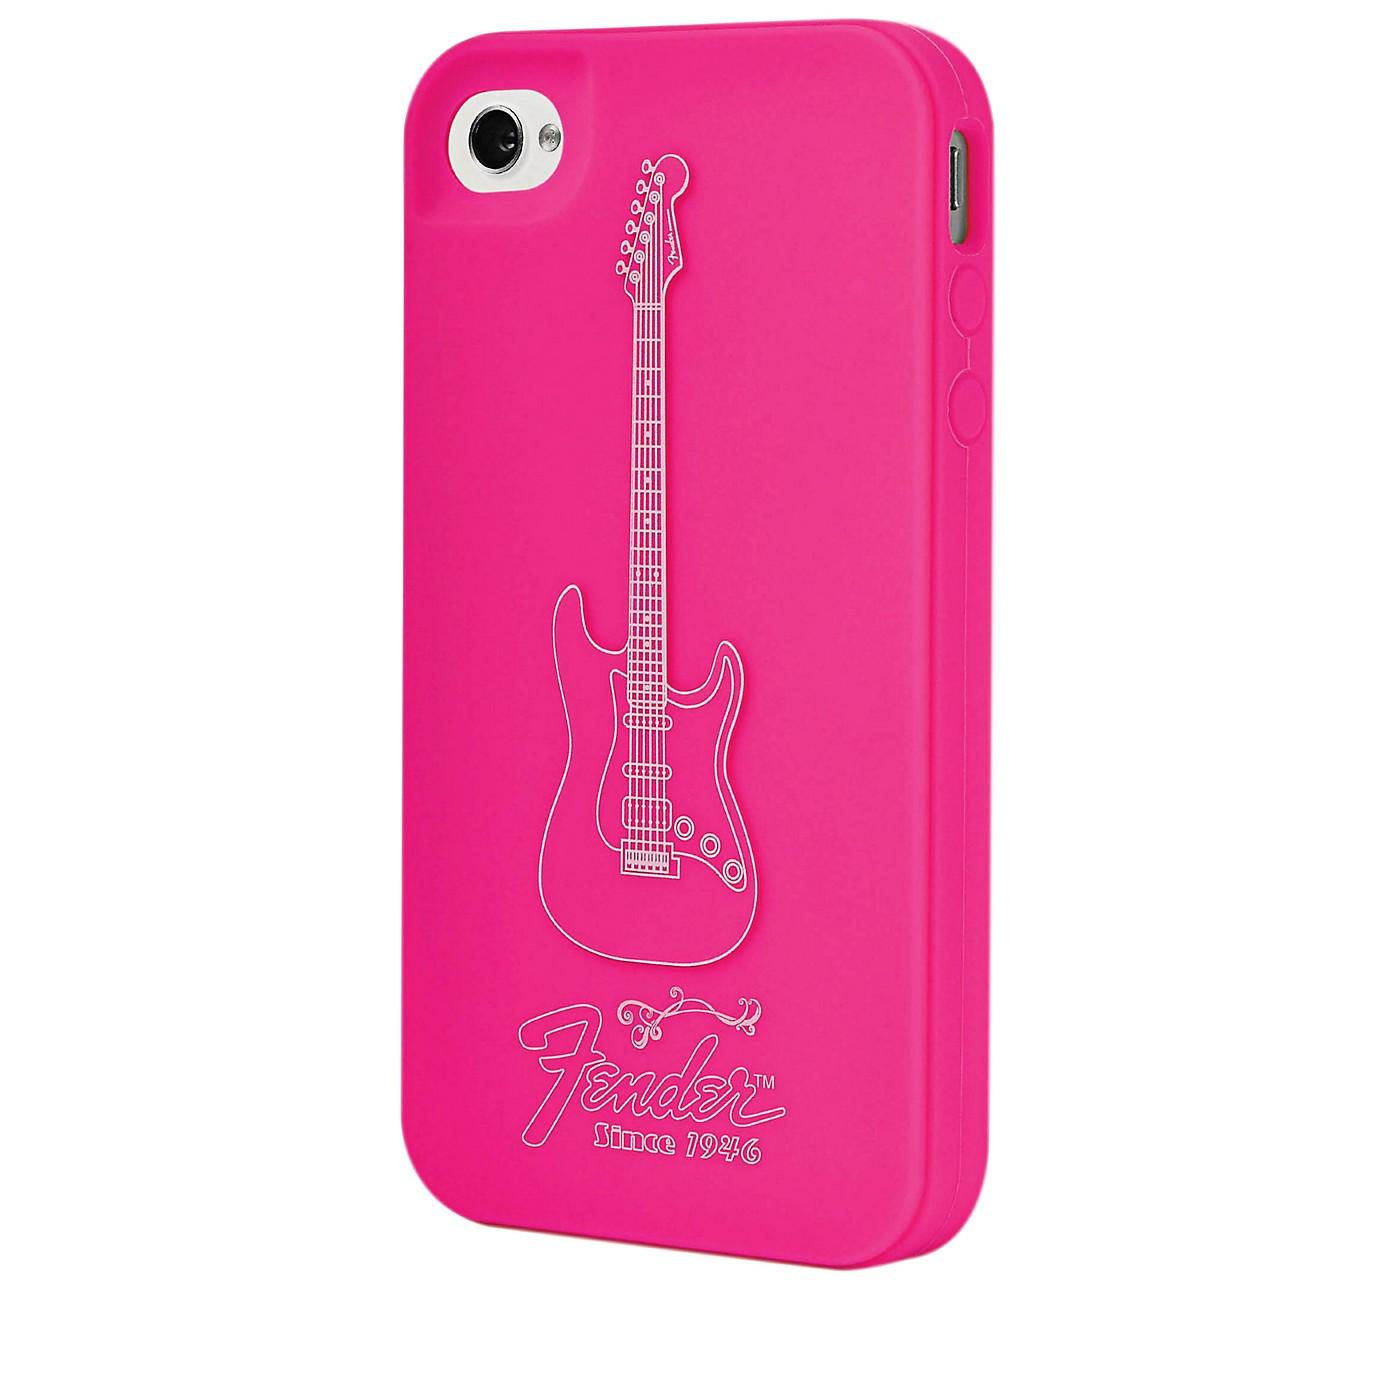 Hal Leonard Contour Design Fender iPhone 4/4S Genuine Magenta Silicone Protective Case thumbnail